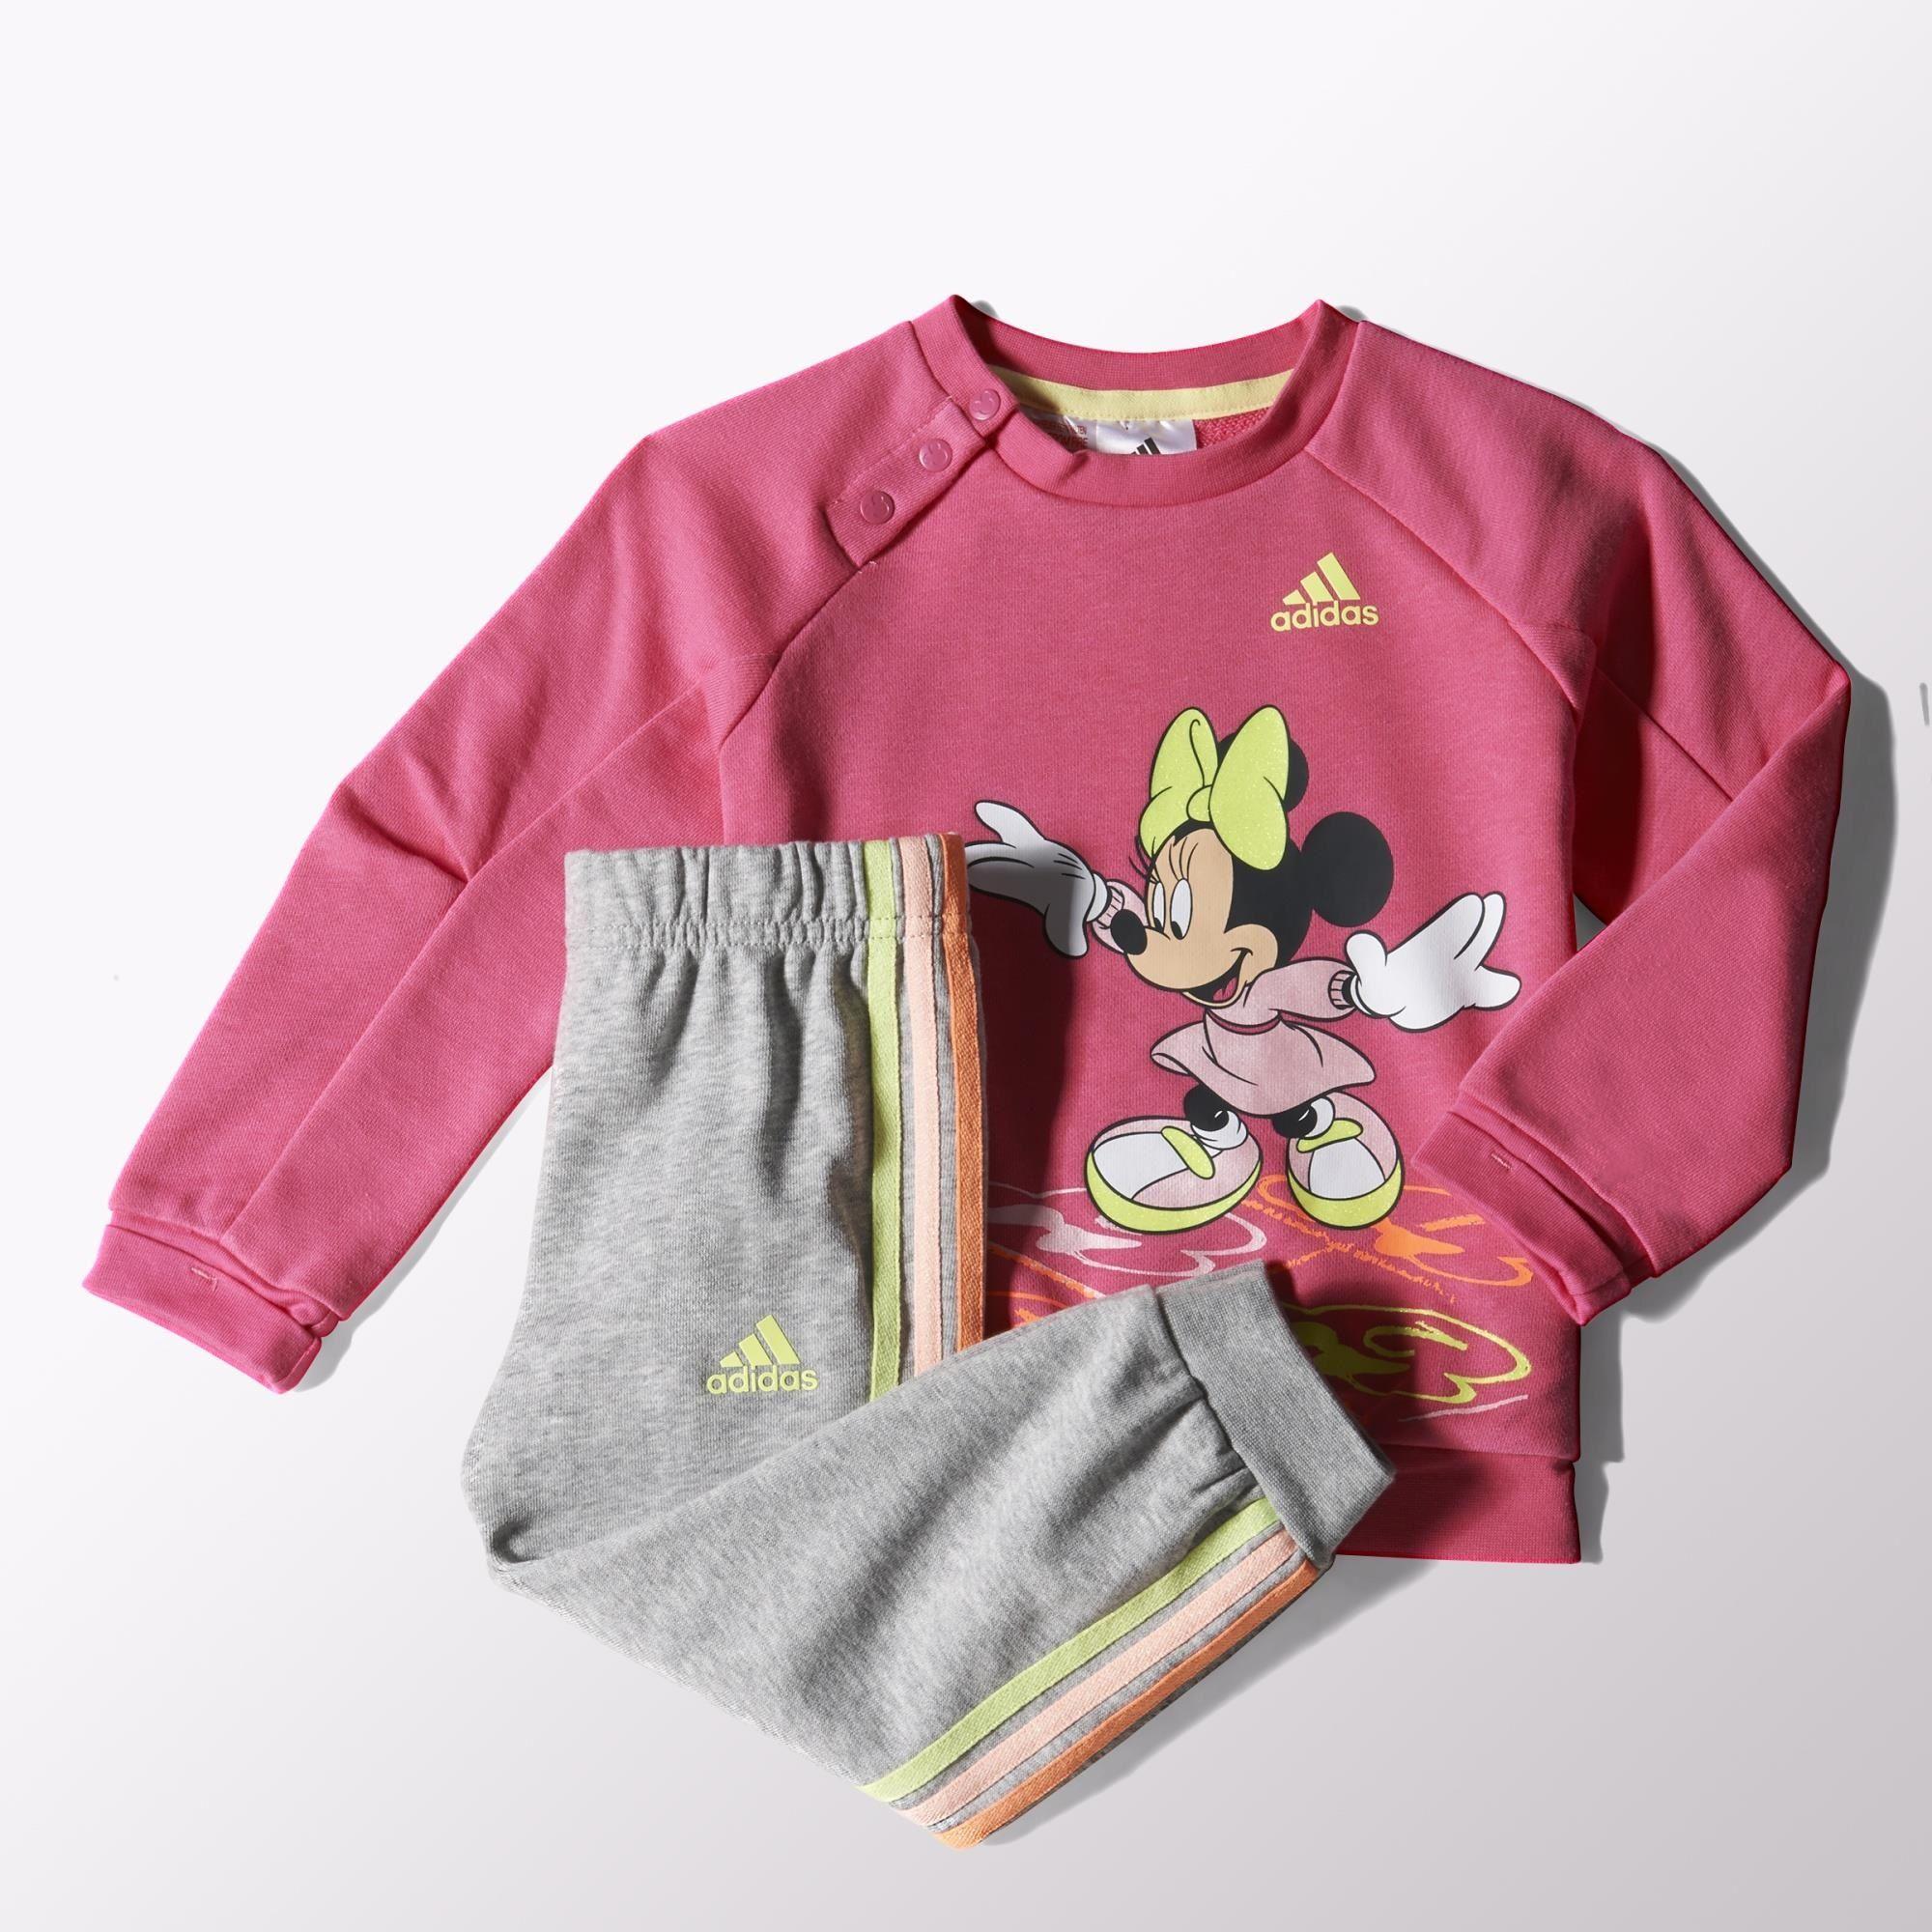 df96f14878f Adidas Chándal Infantil Disney Minnie Mouse (rosado gris lima)